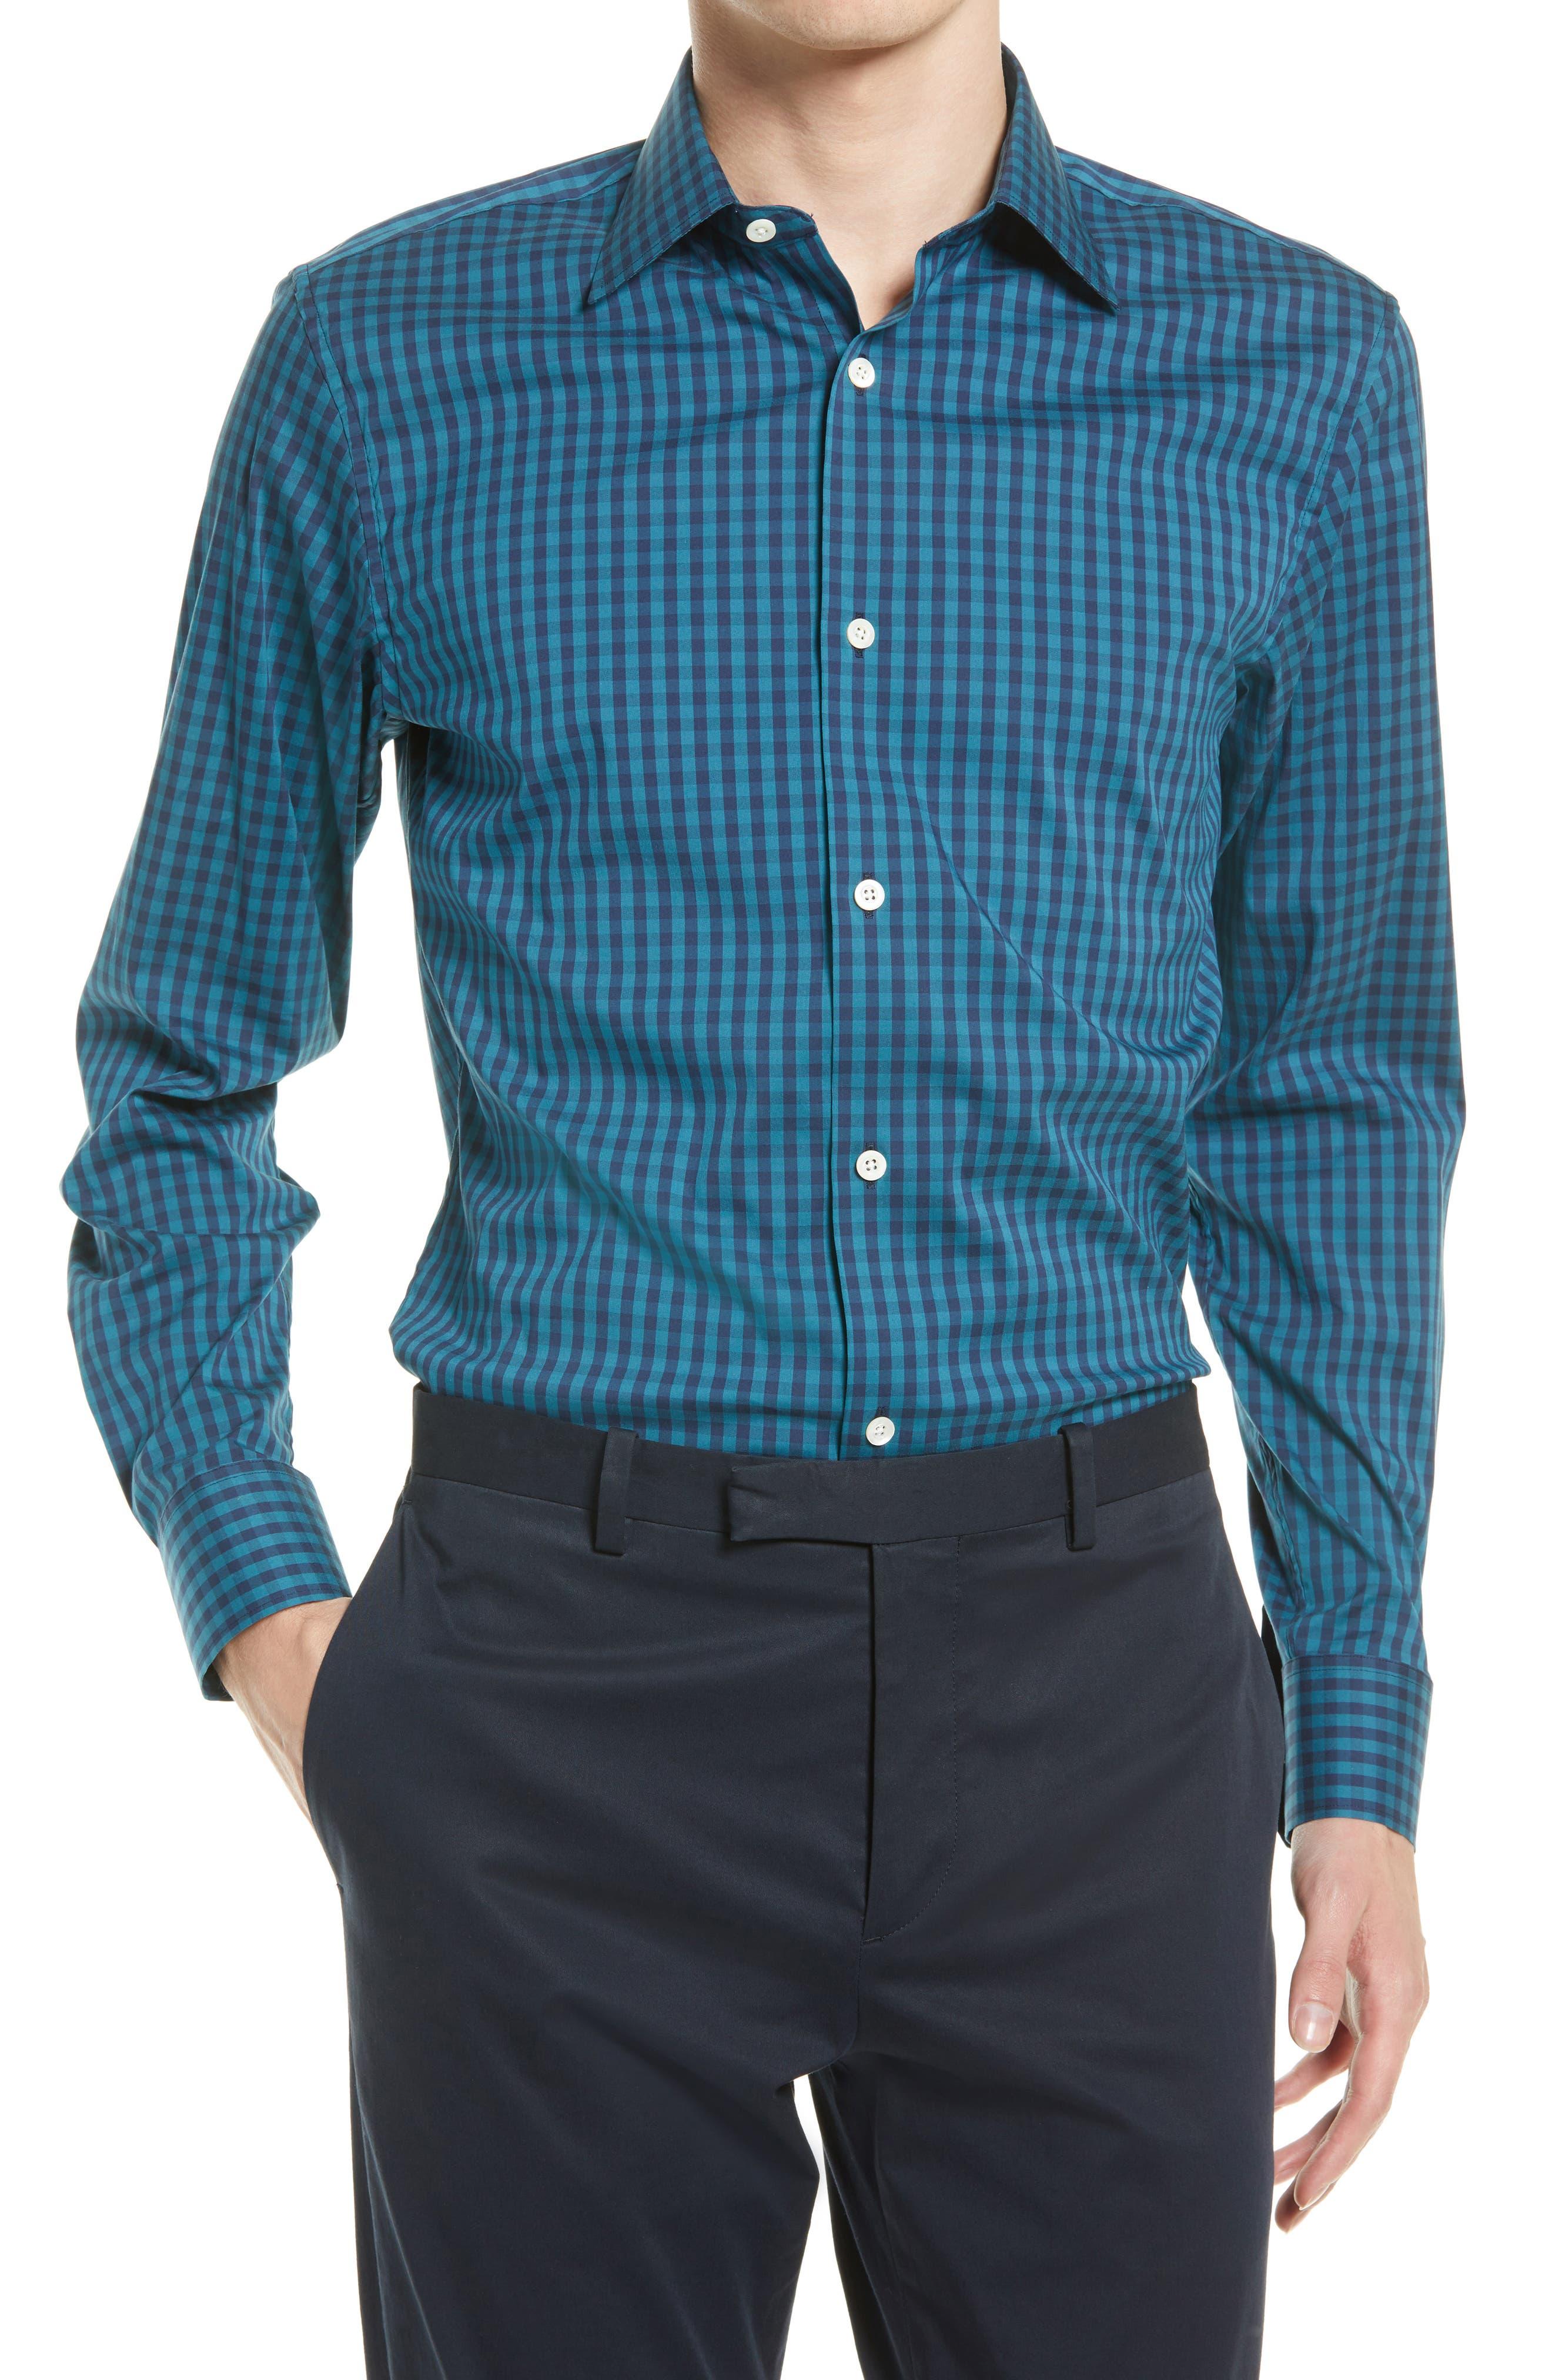 Jetsetter Slim Fit Gingham Stretch Dress Shirt